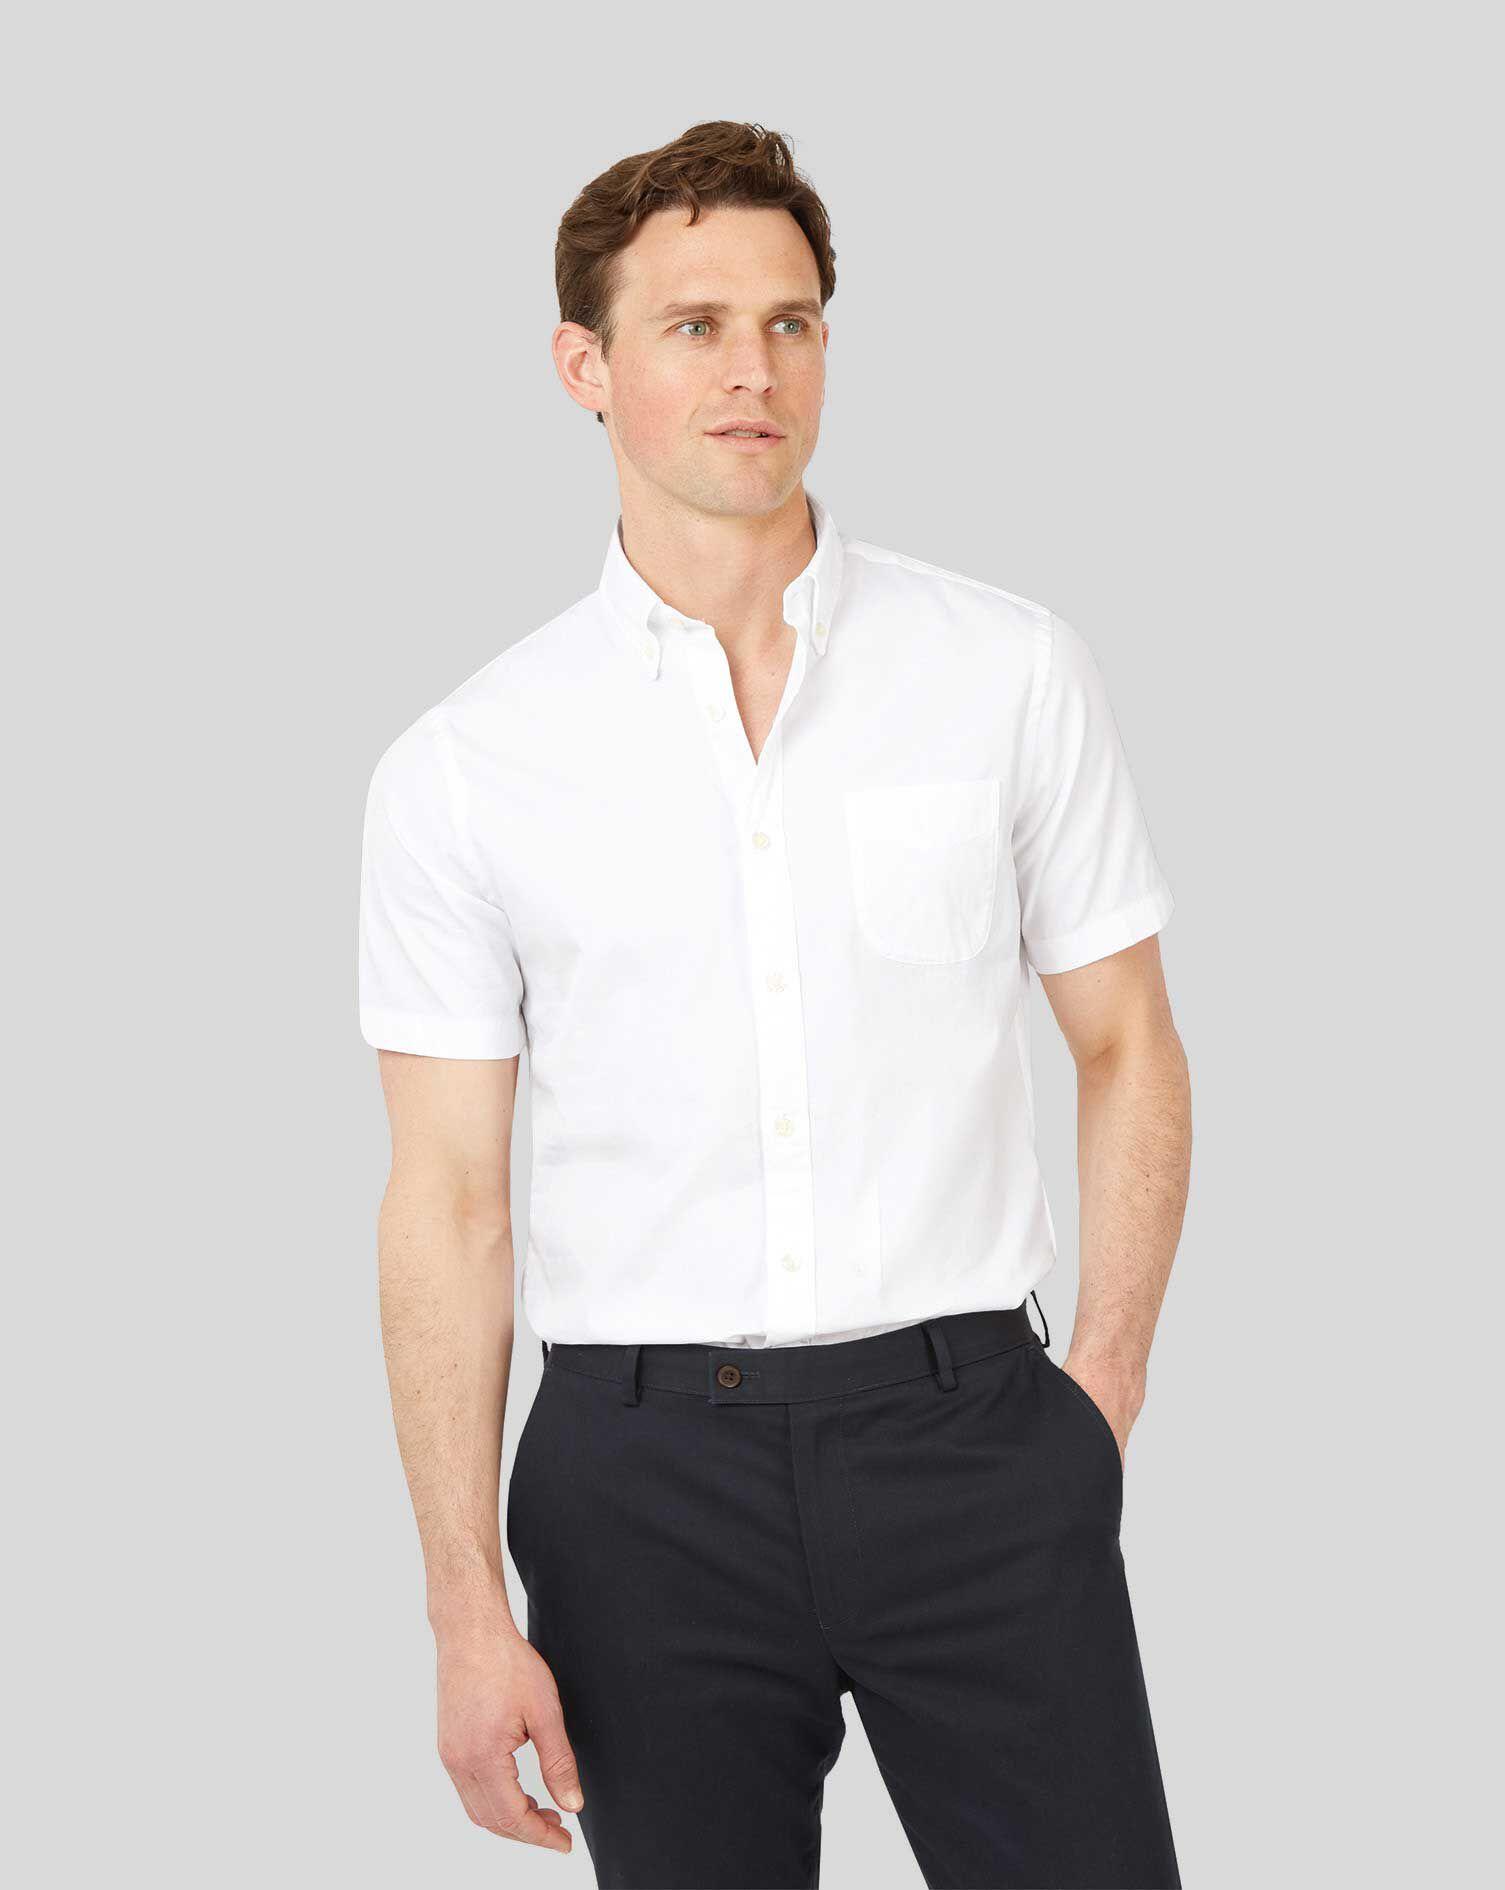 4 Sleeve Button Down Shirt